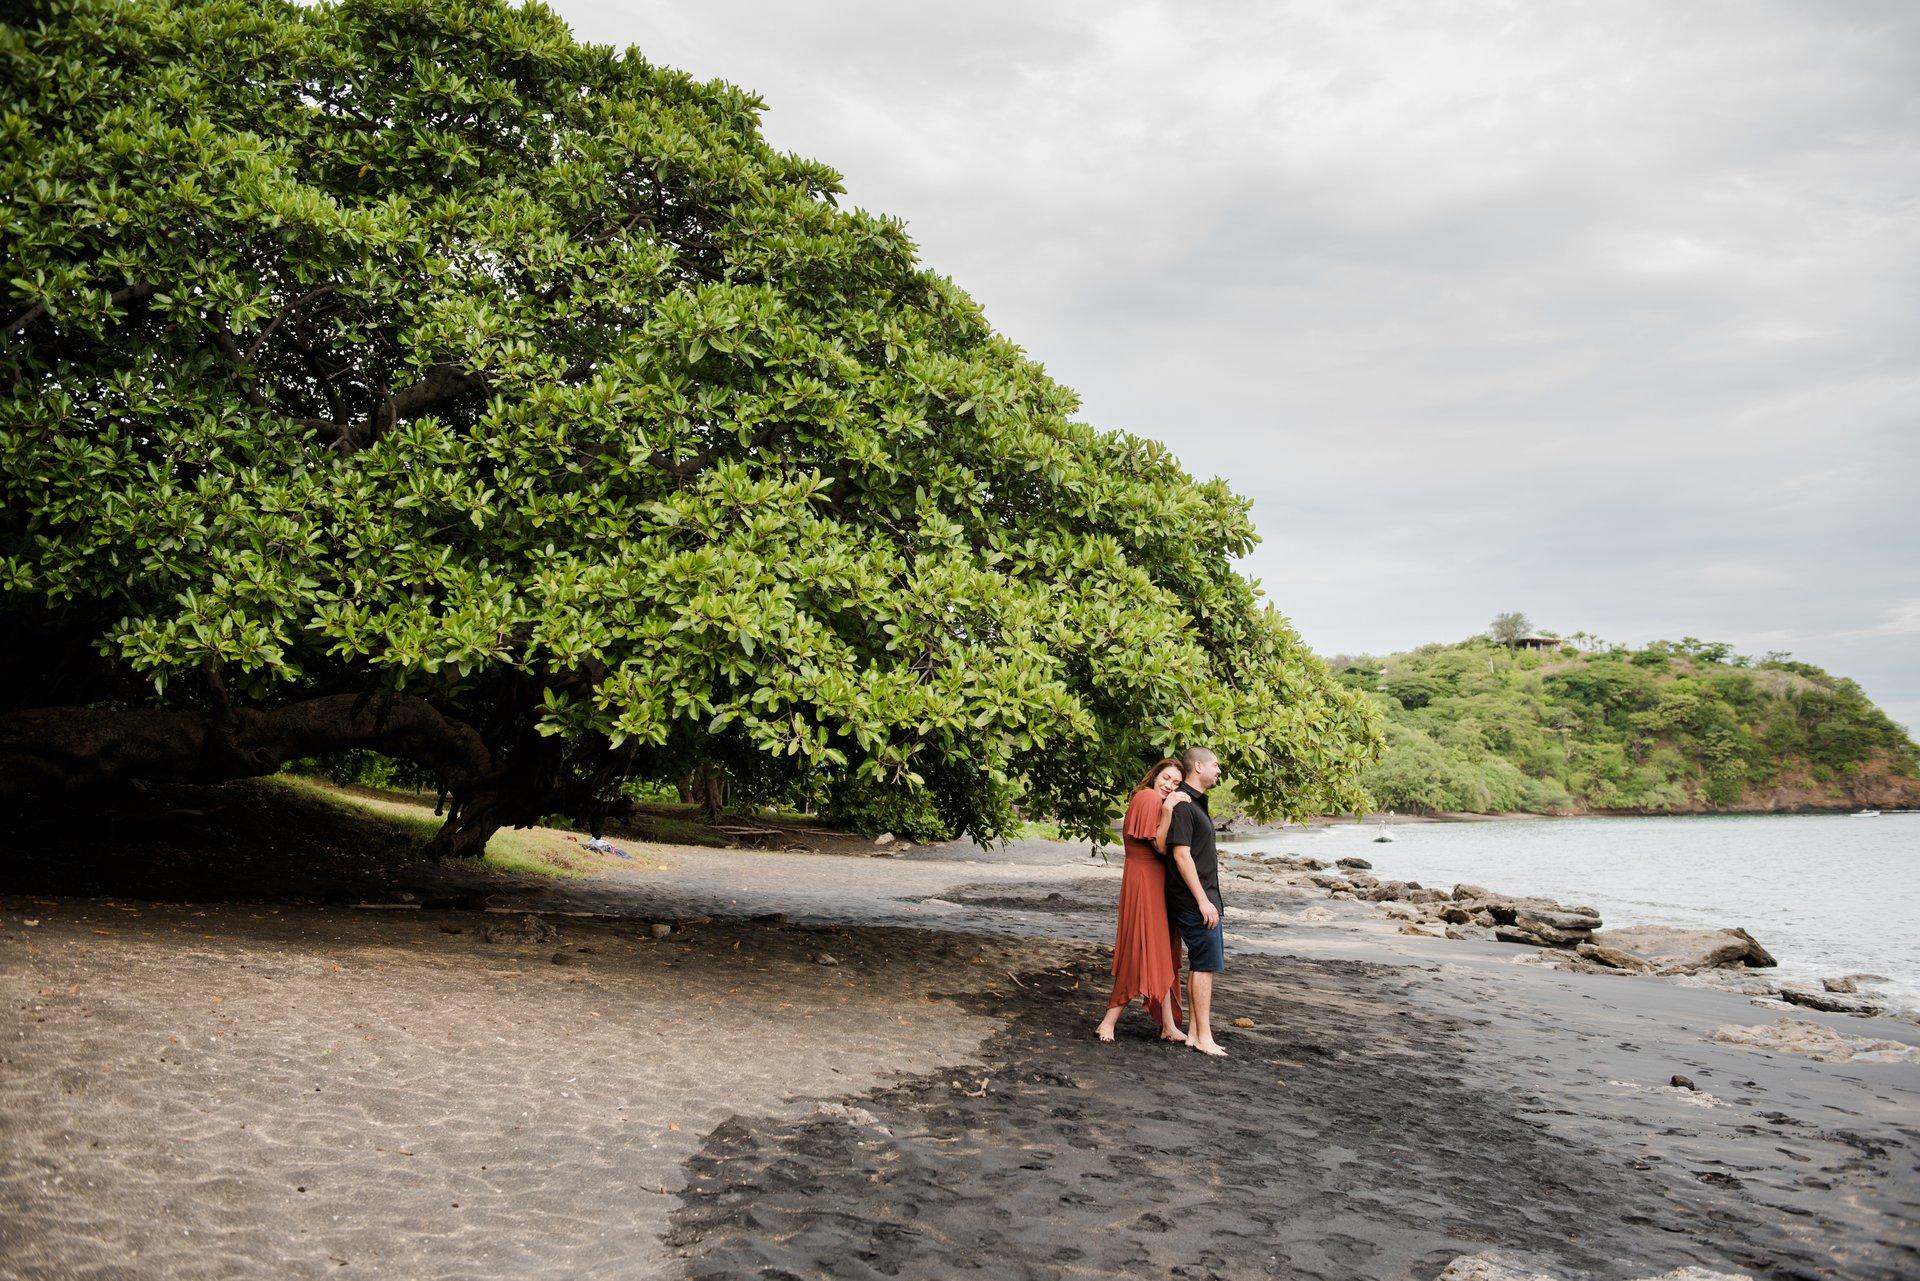 Guanacaste-Costa Rica-travel-story-Flytographer-11